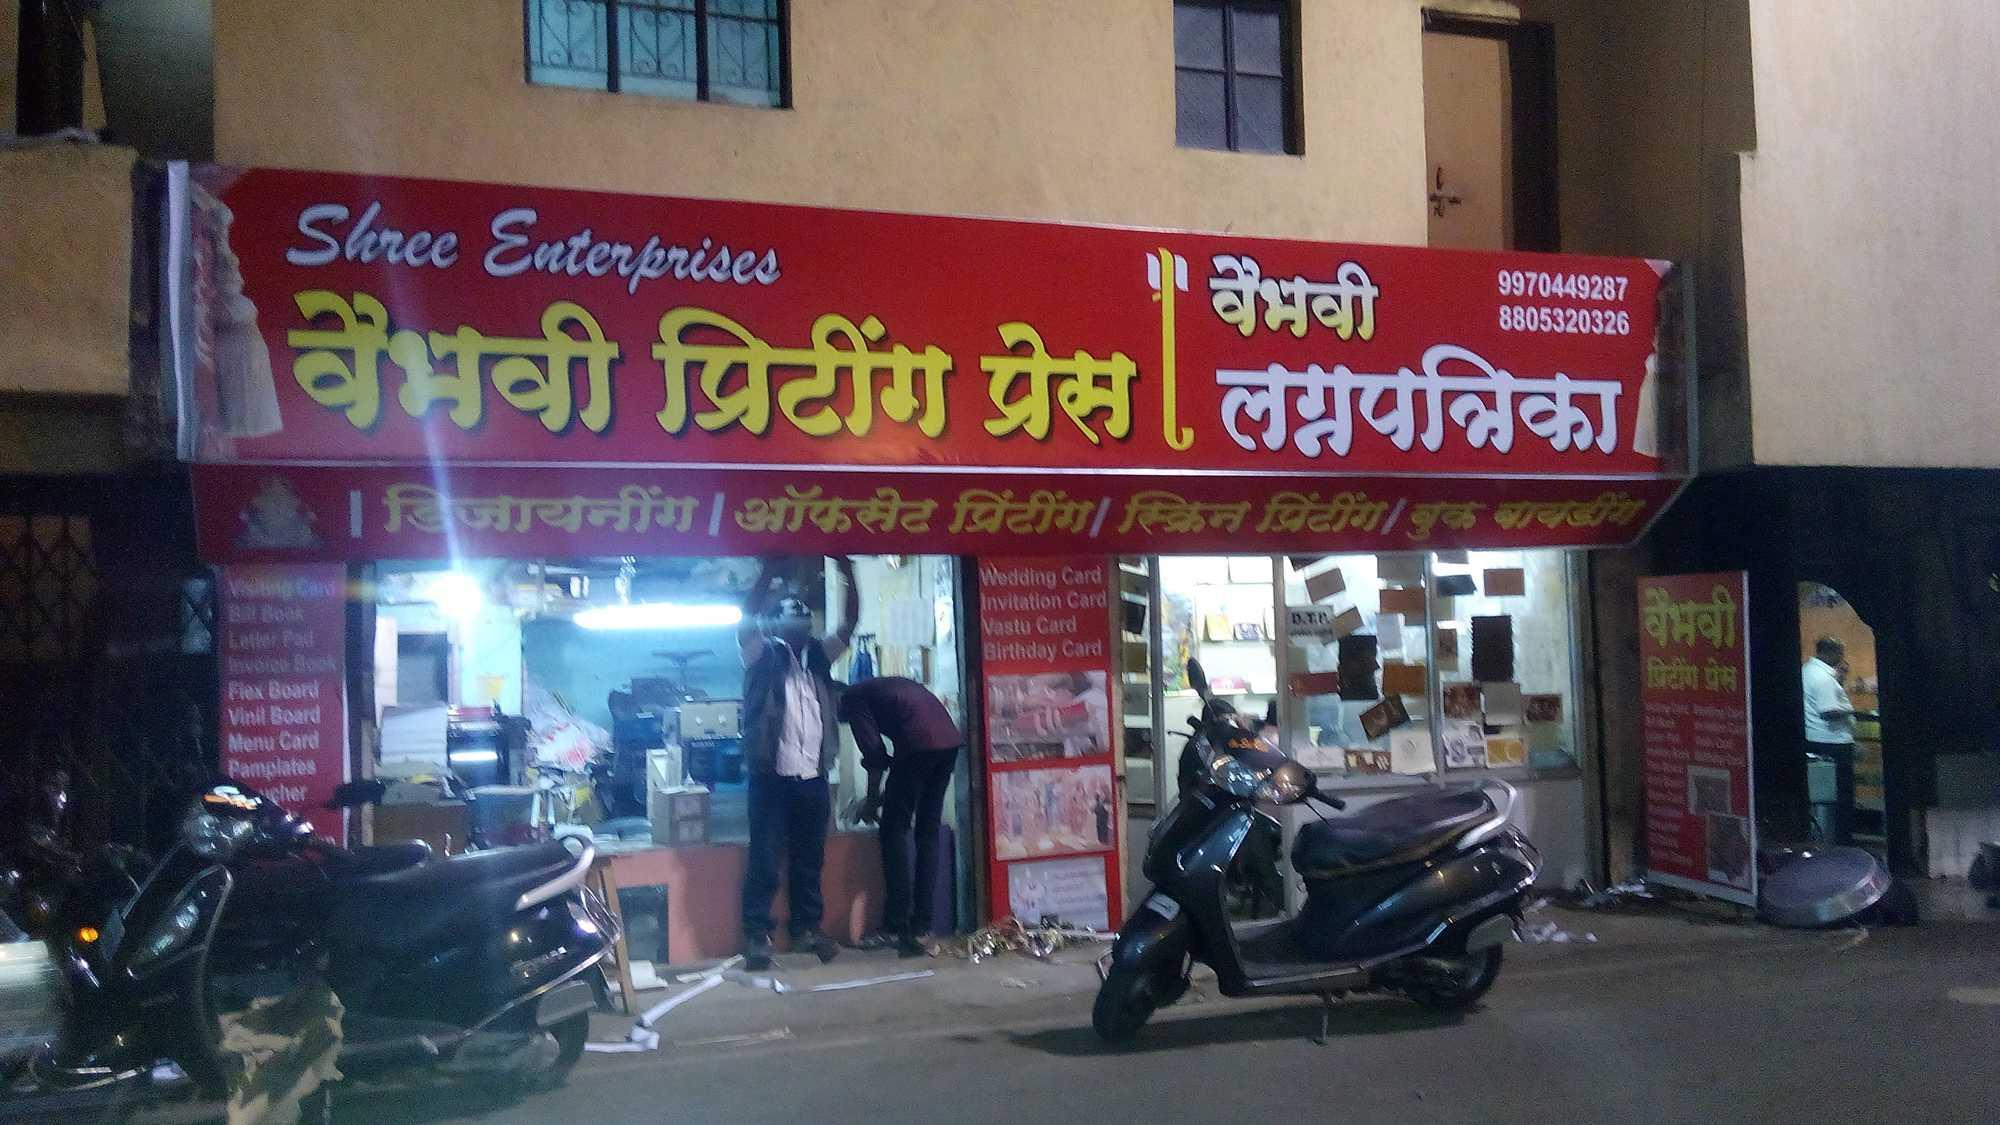 Clipart gadgil viman nagar clip royalty free library Printing Press in Viman Nagar, pune - Printing Services - Justdial clip royalty free library